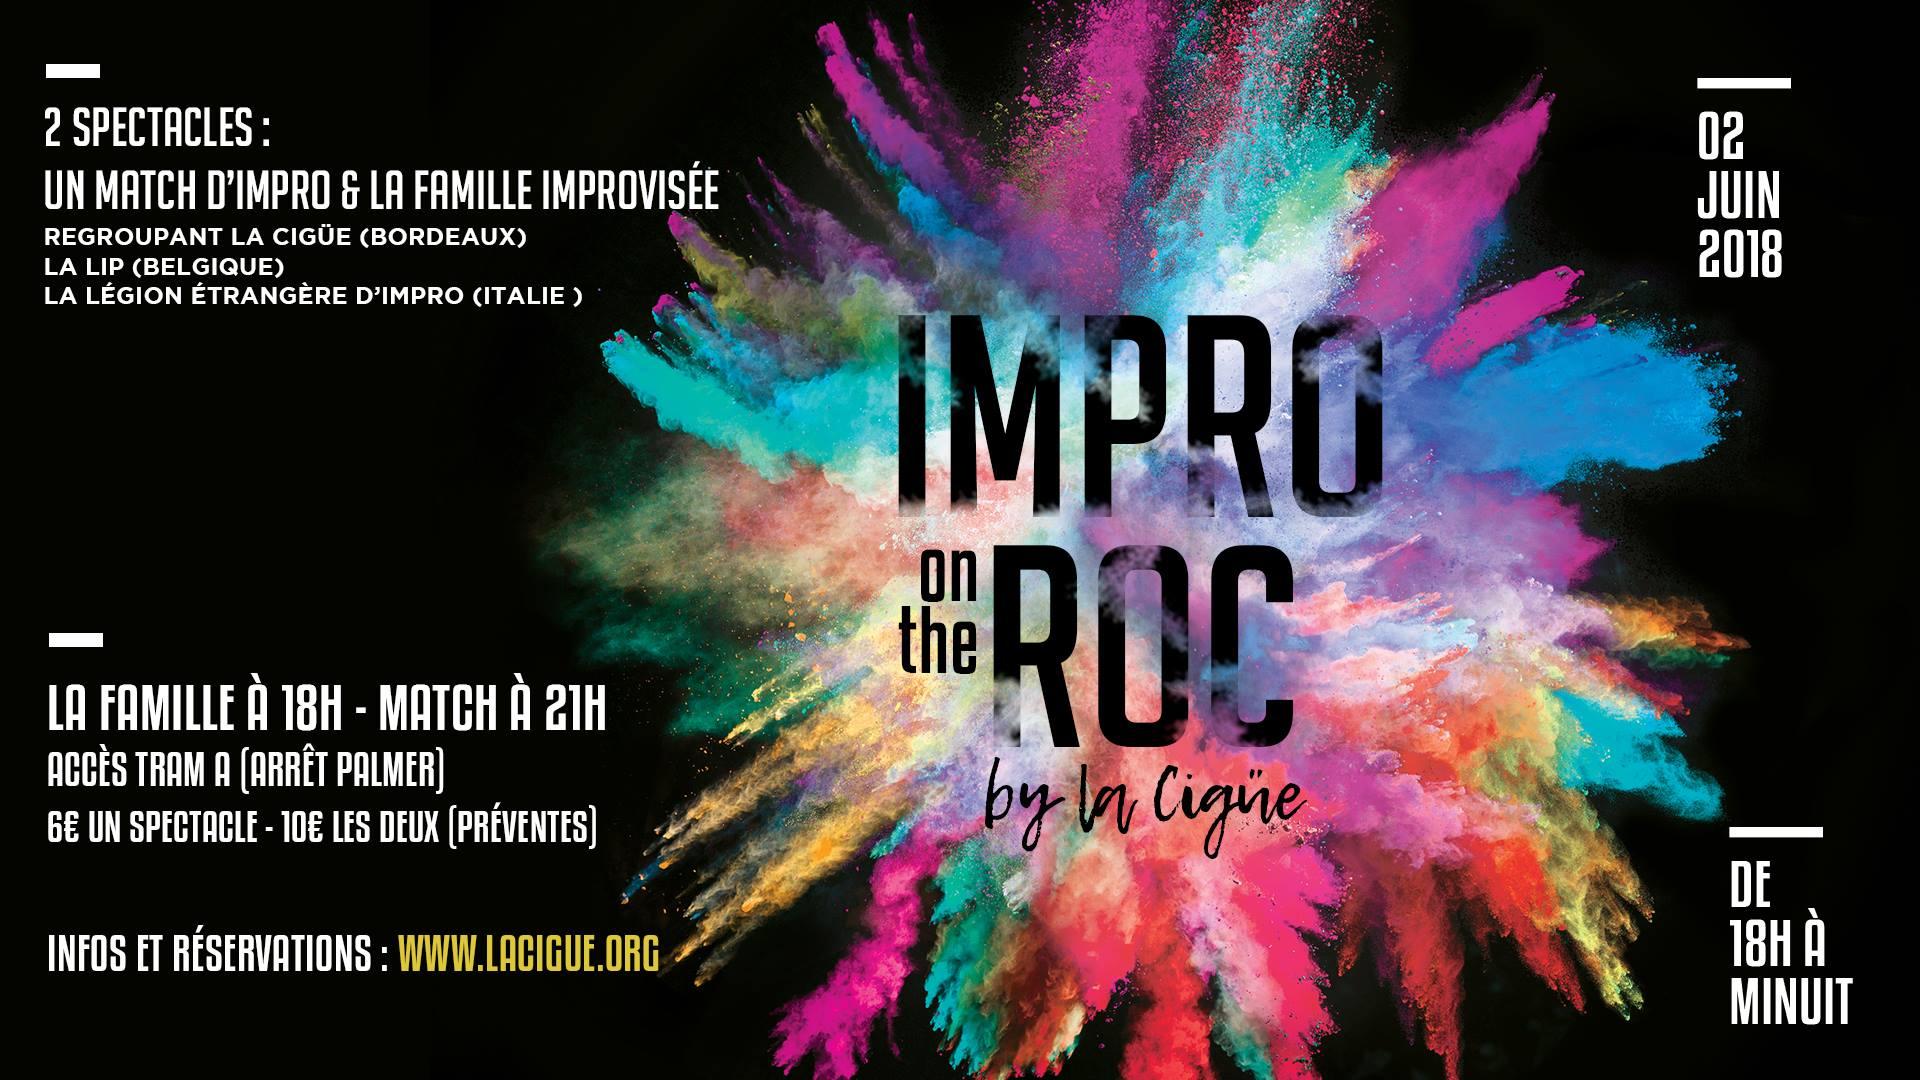 Impro On the Roc' #3